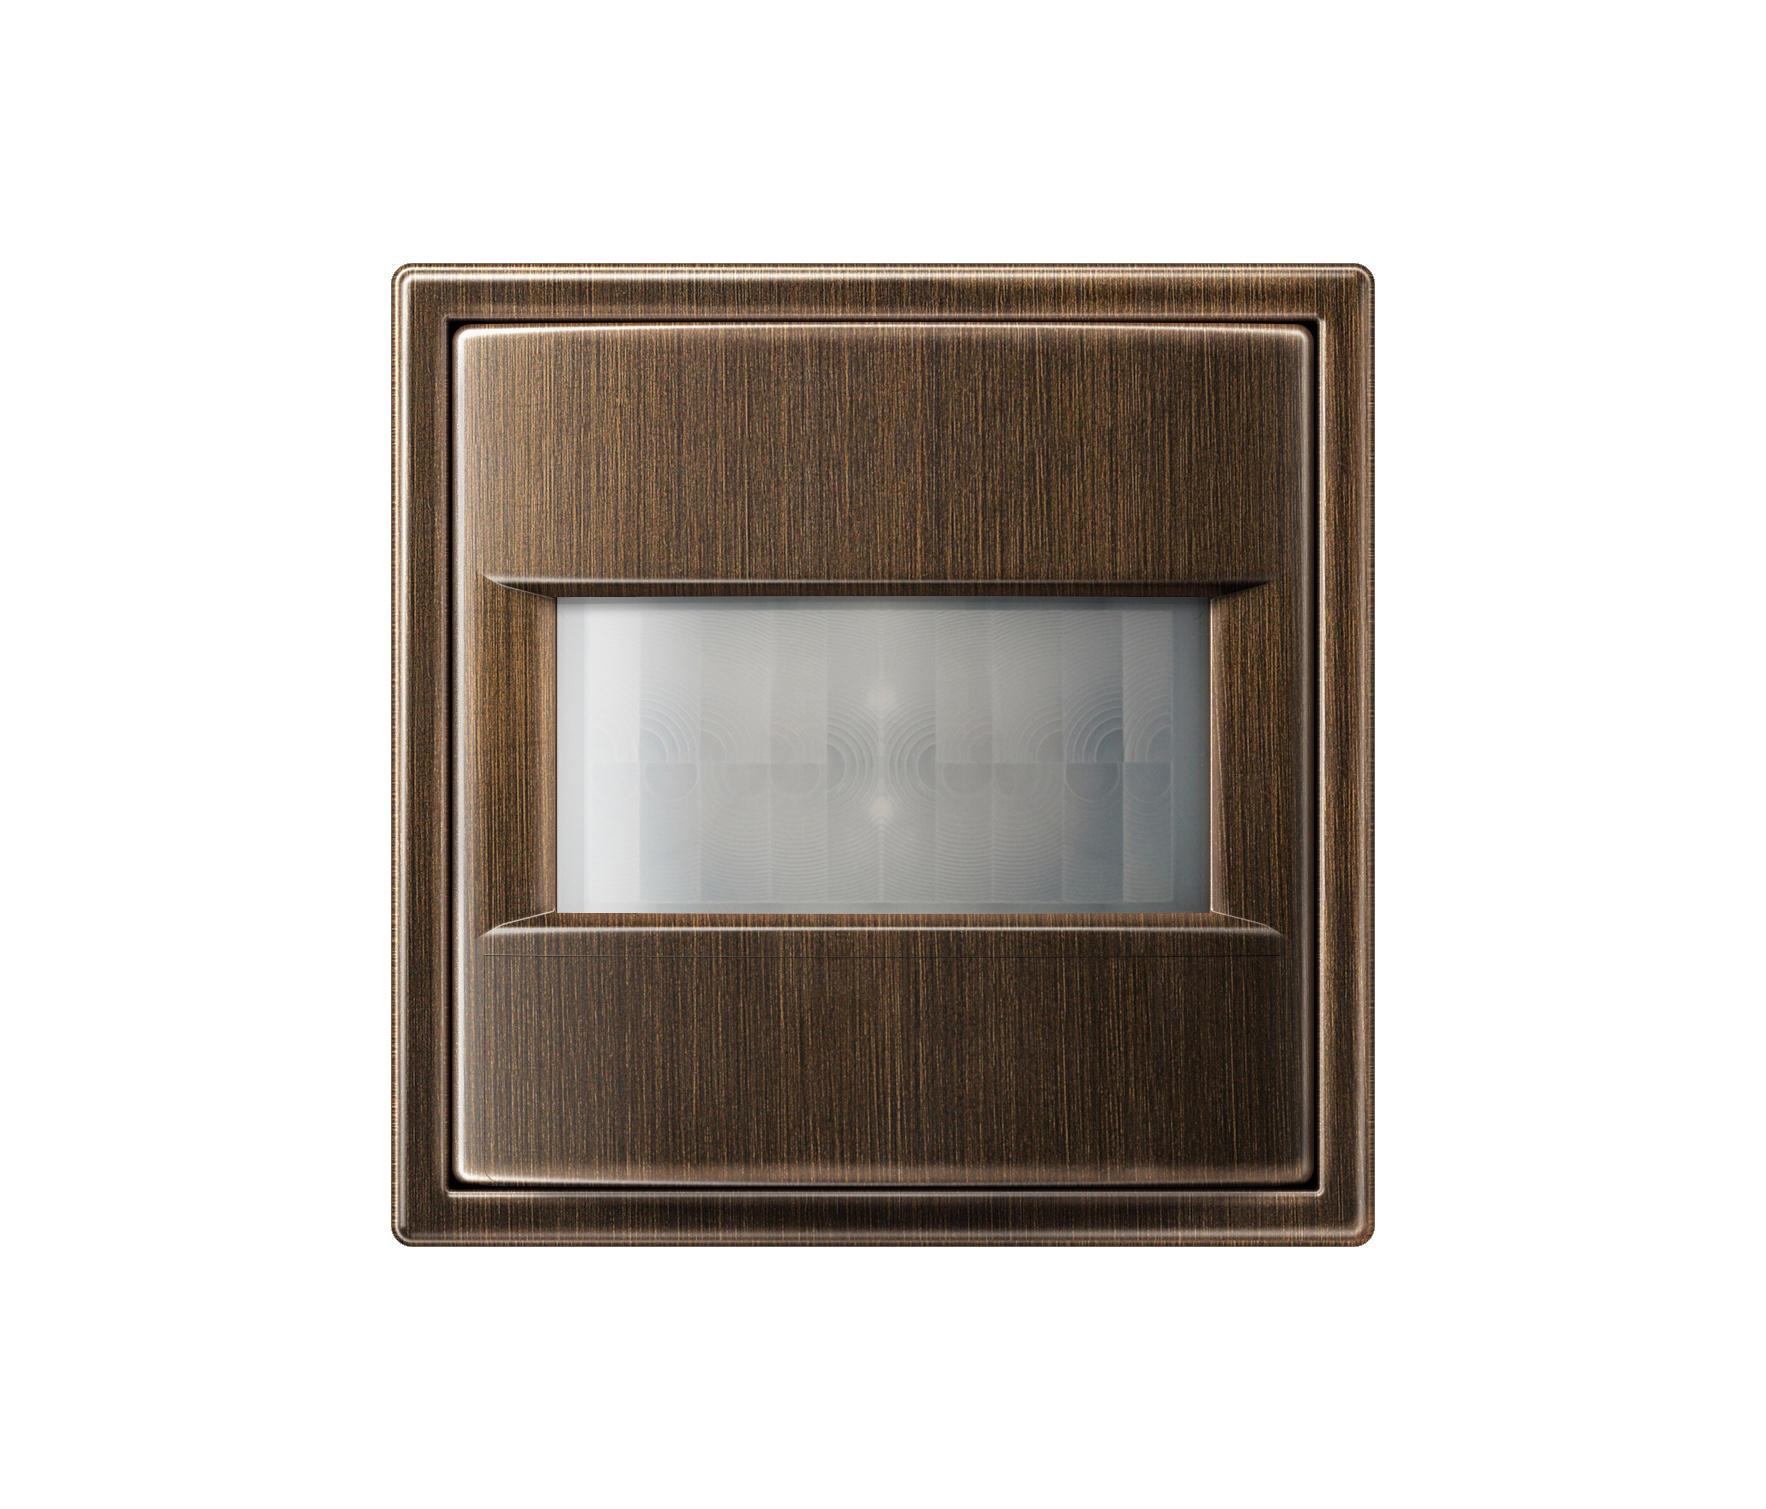 ls 990 messing antik automatik schalter automatikschalter von jung architonic. Black Bedroom Furniture Sets. Home Design Ideas